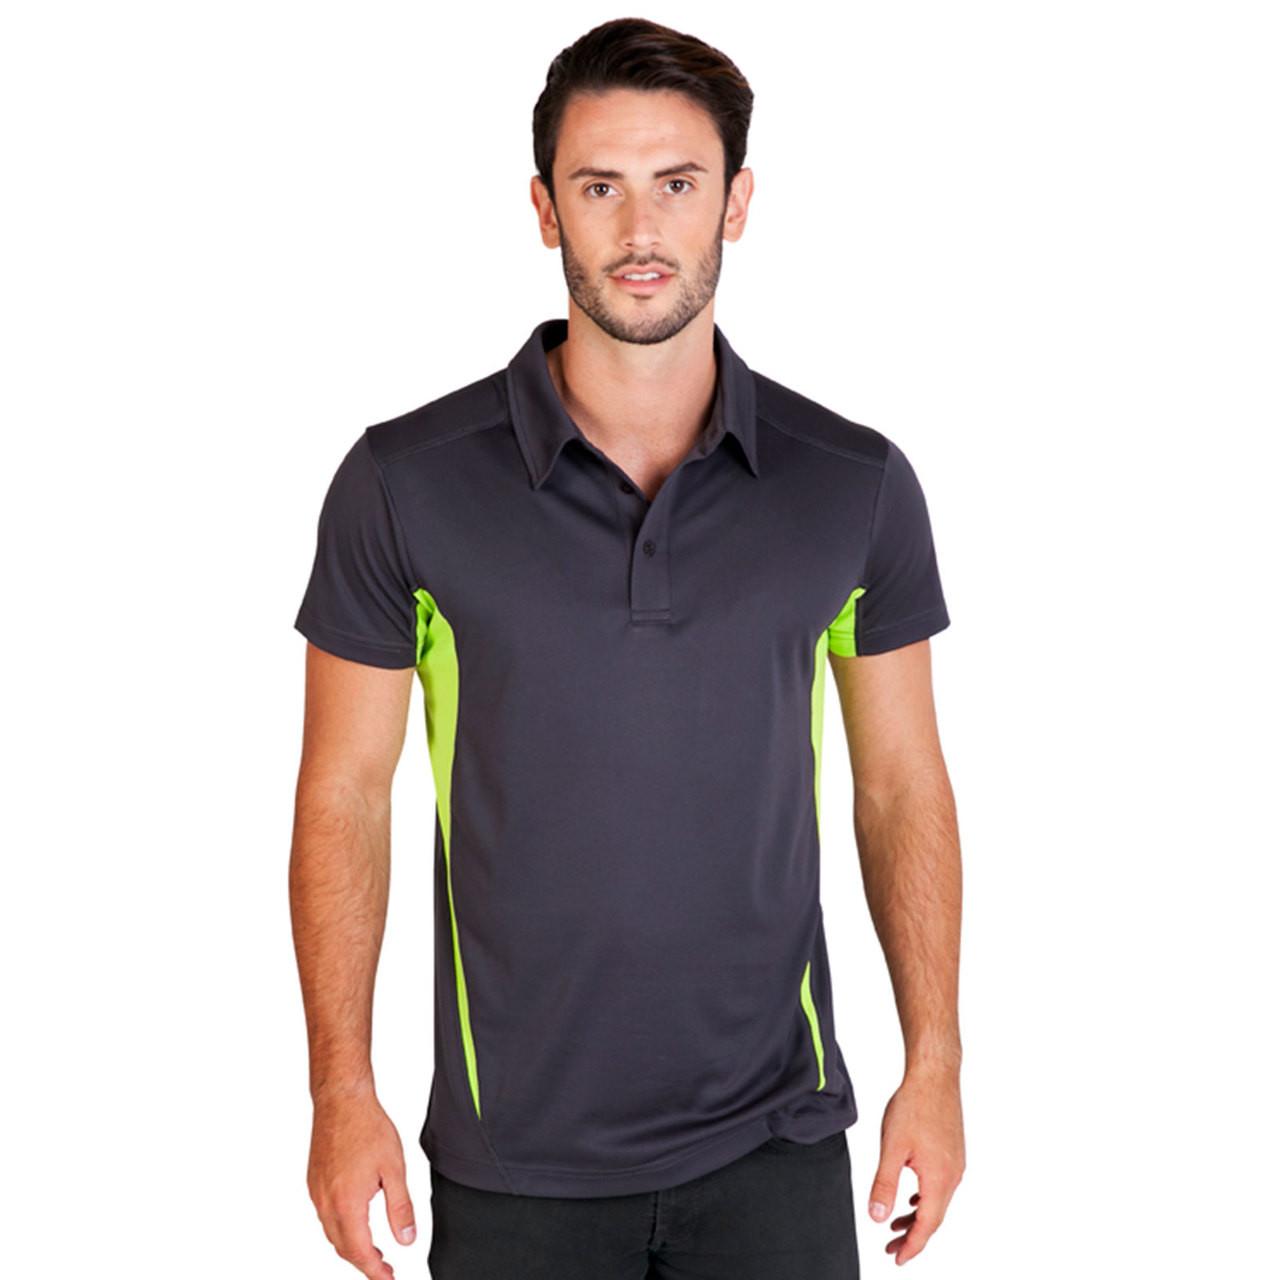 a516b0c91ed Men Cool Dry Contrast Polo Shirts | Buy Plain Sports Wear & Uniform Online